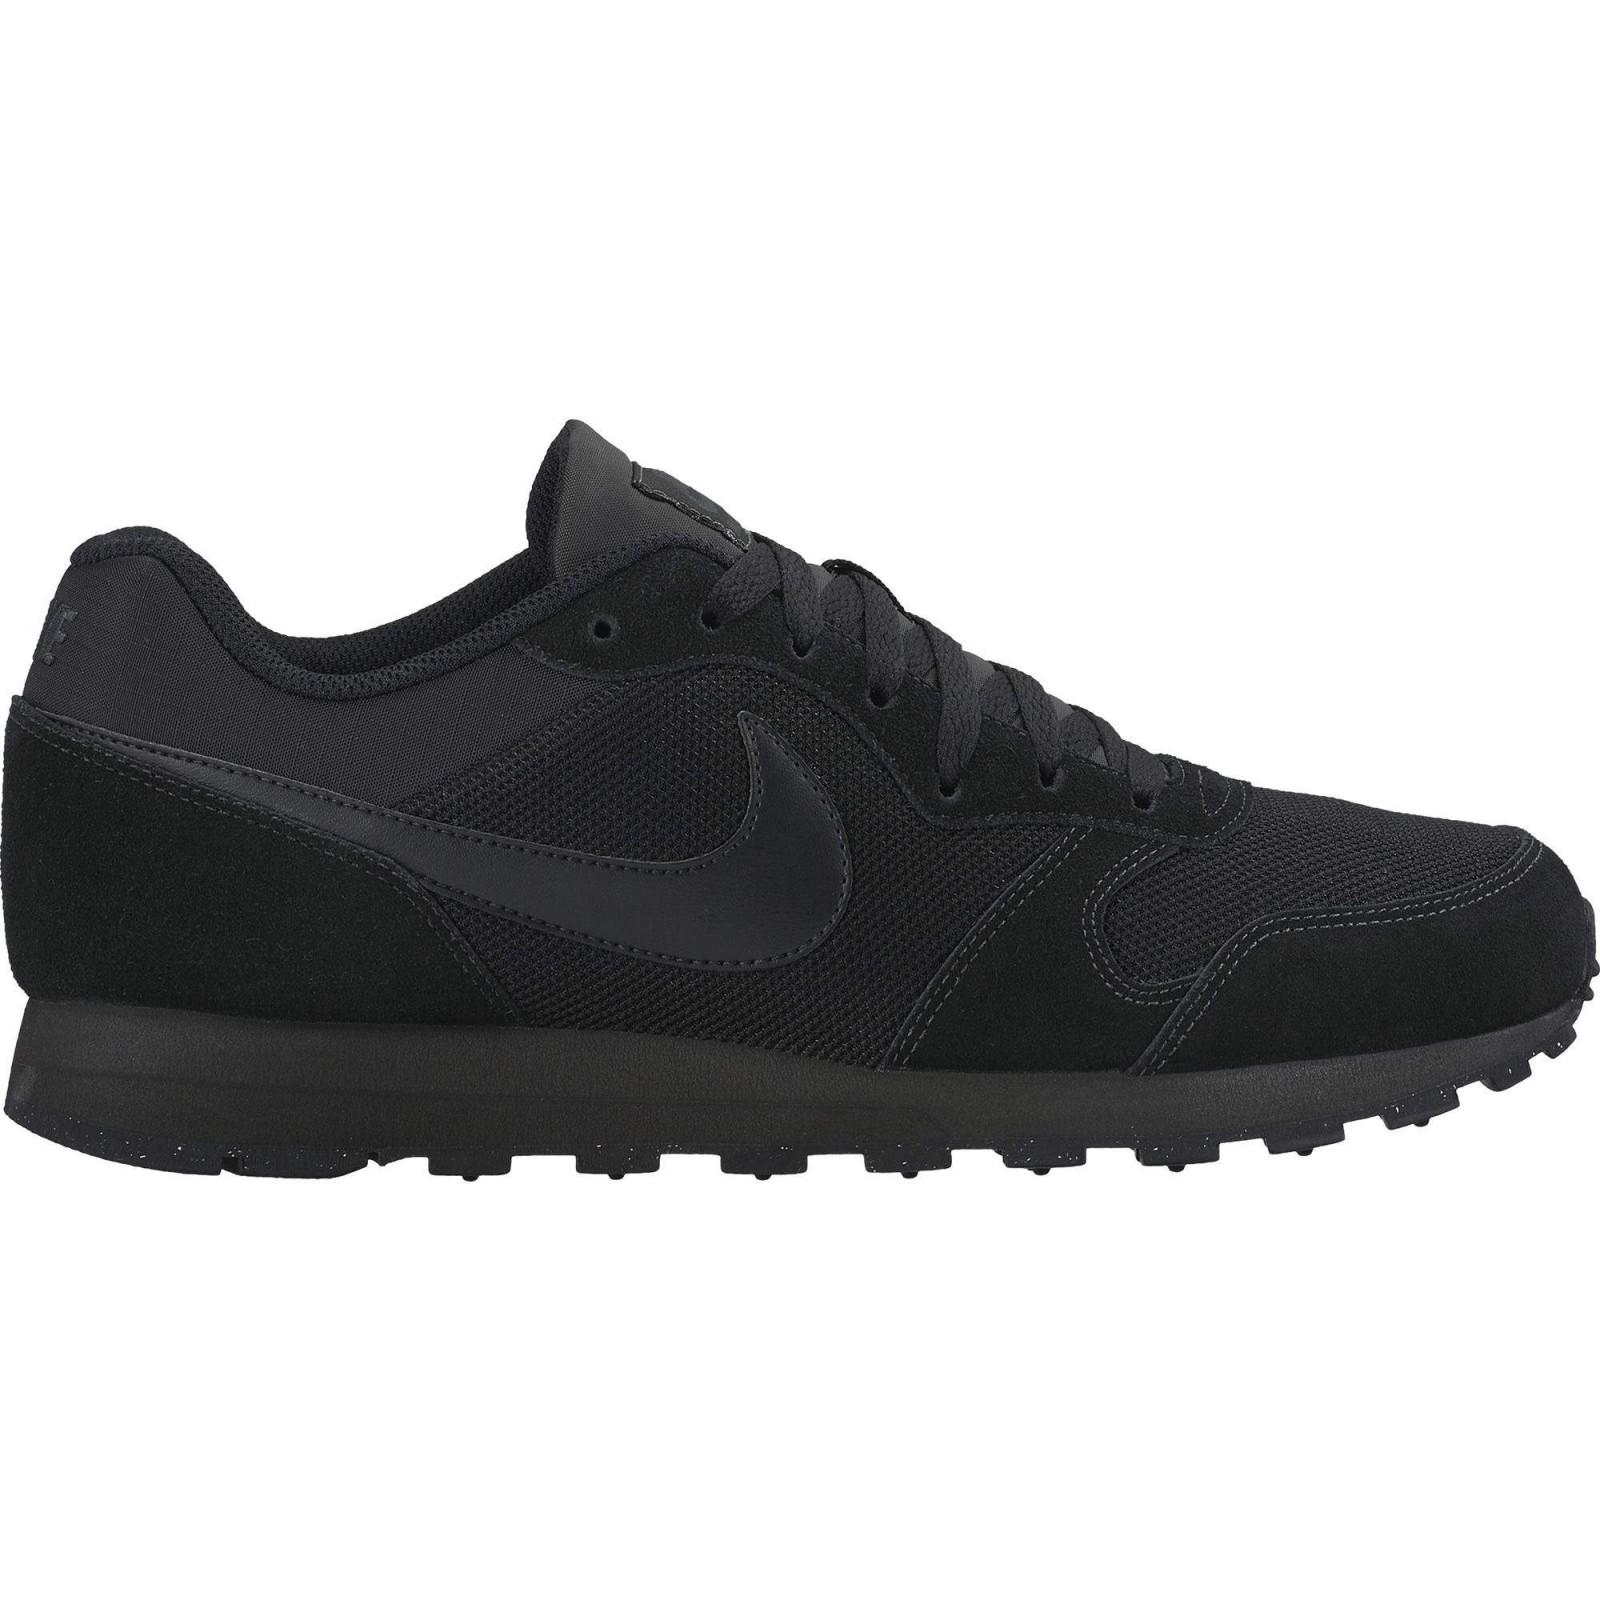 Pánské tenisky Nike MD RUNNER 2  d388e9d1ee5